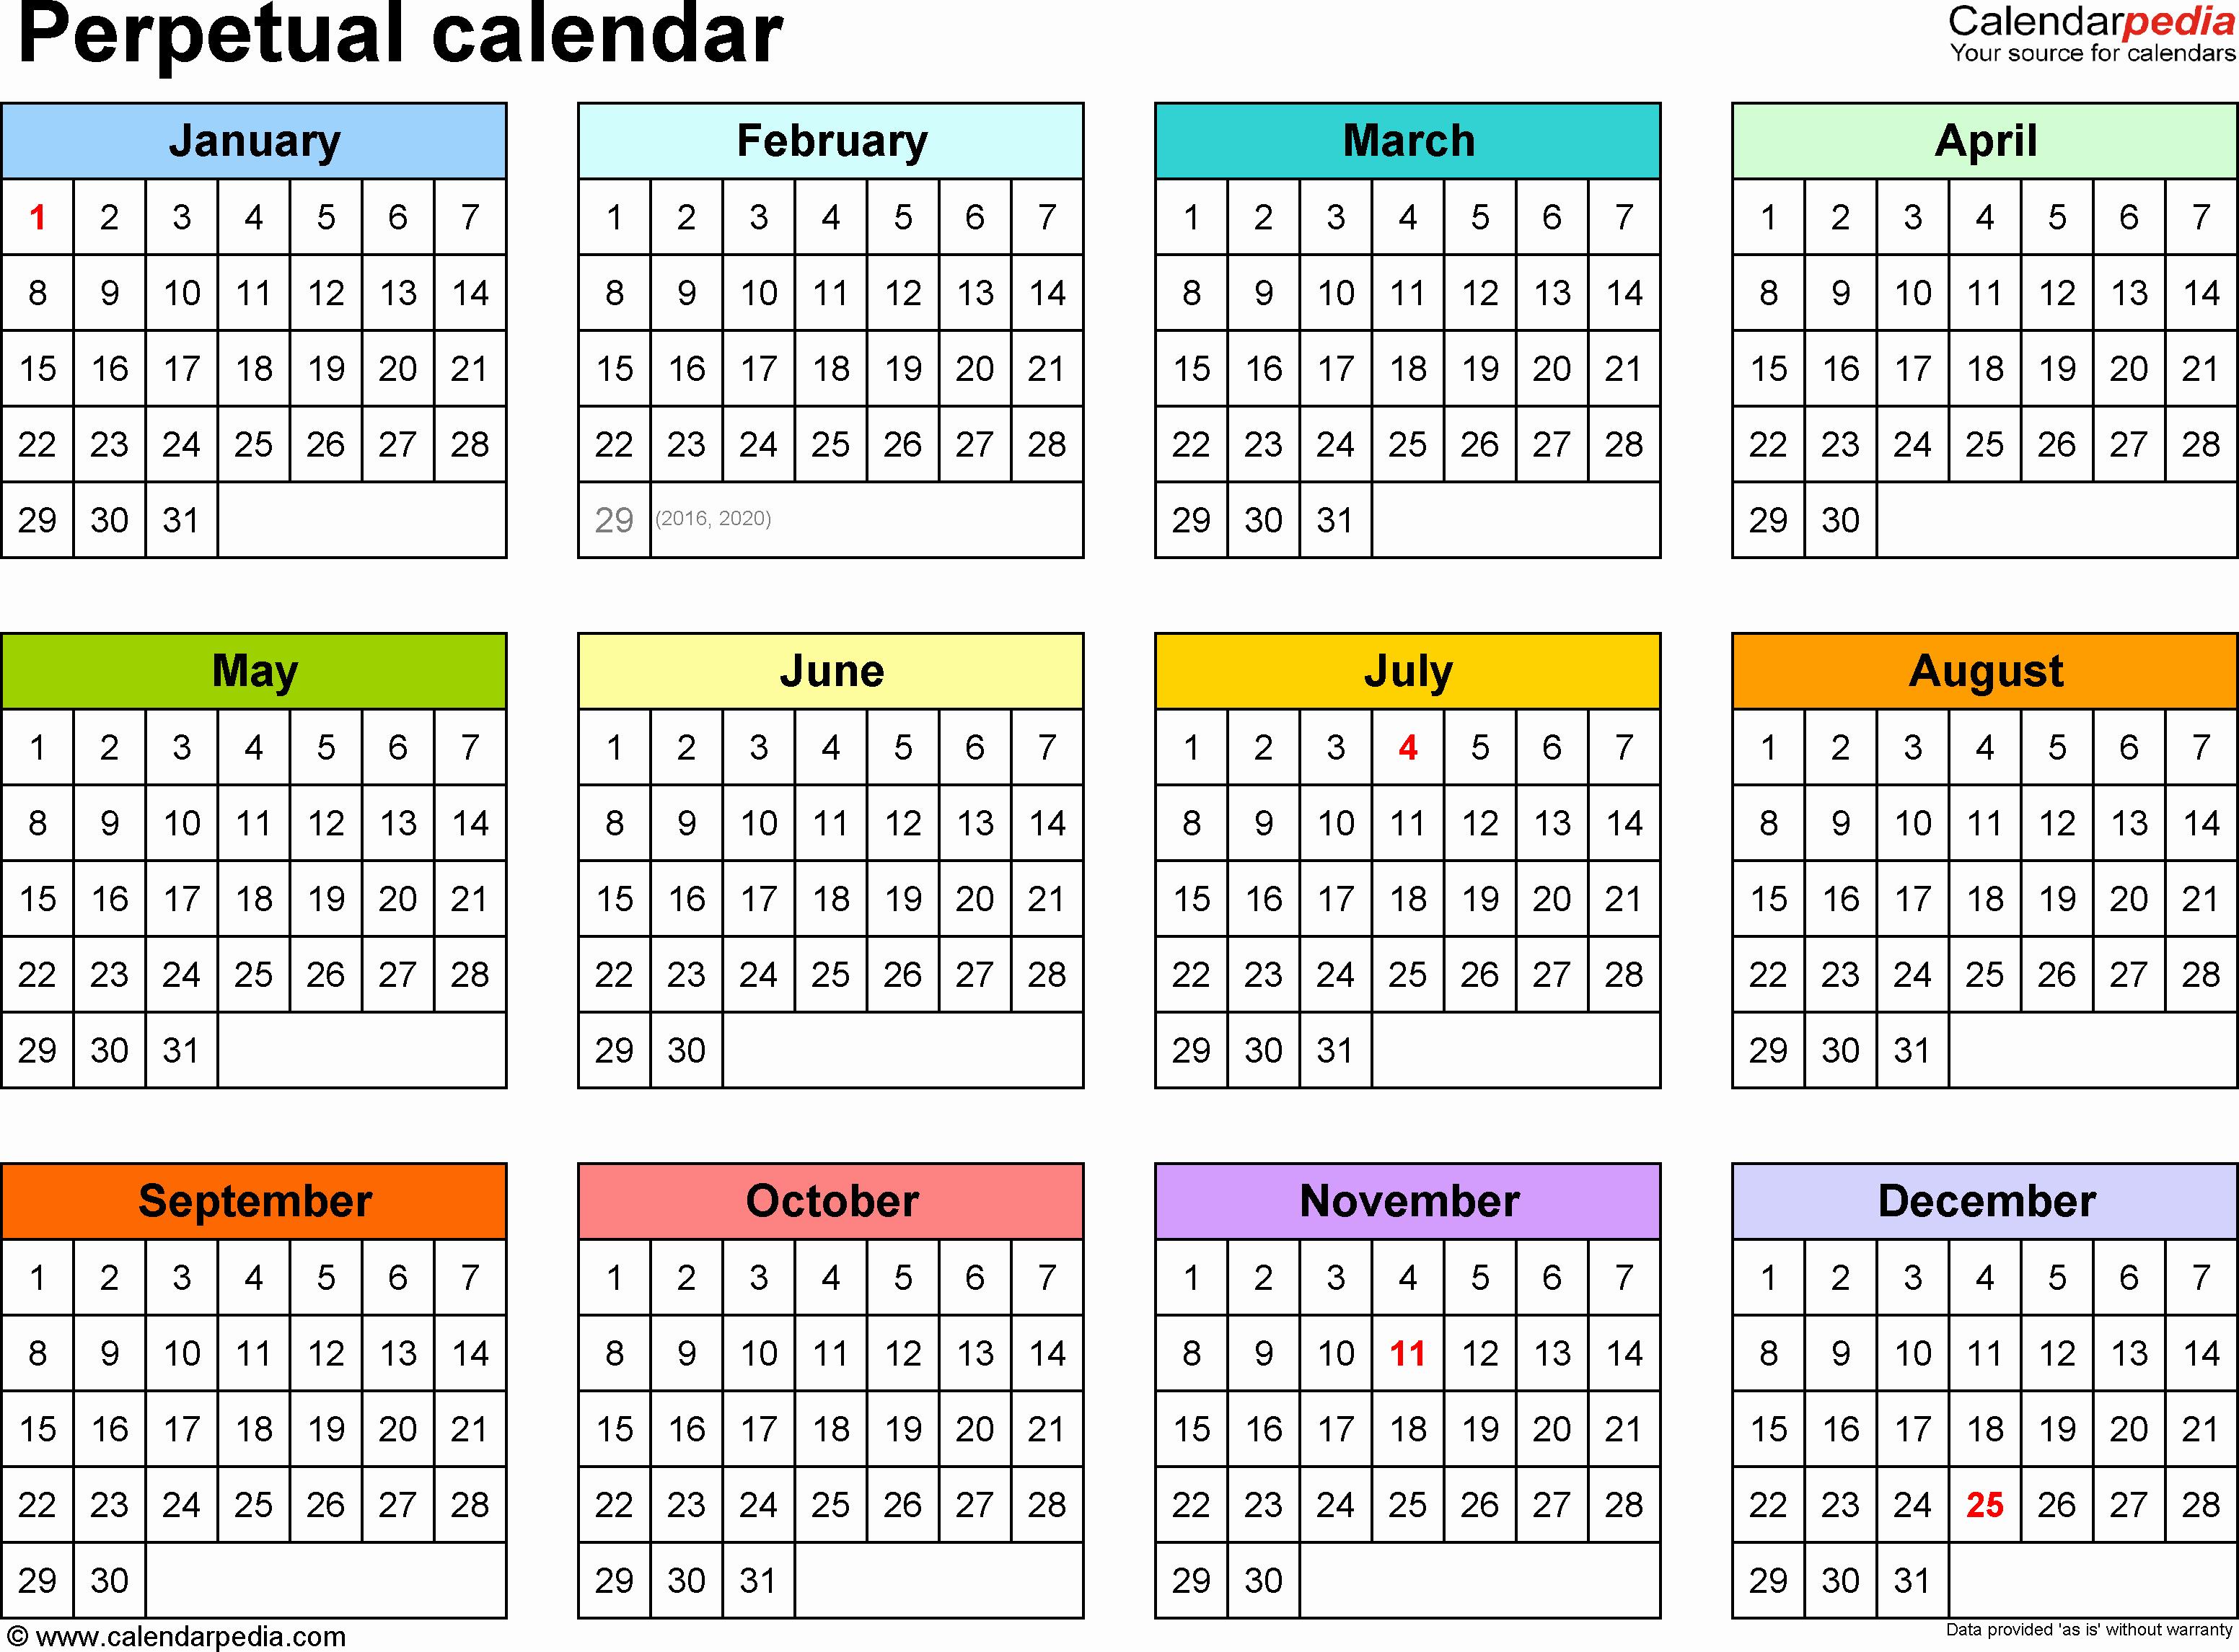 5 Year Calendar Starting 2016 Unique Perpetual Calendars 7 Free Printable Word Templates